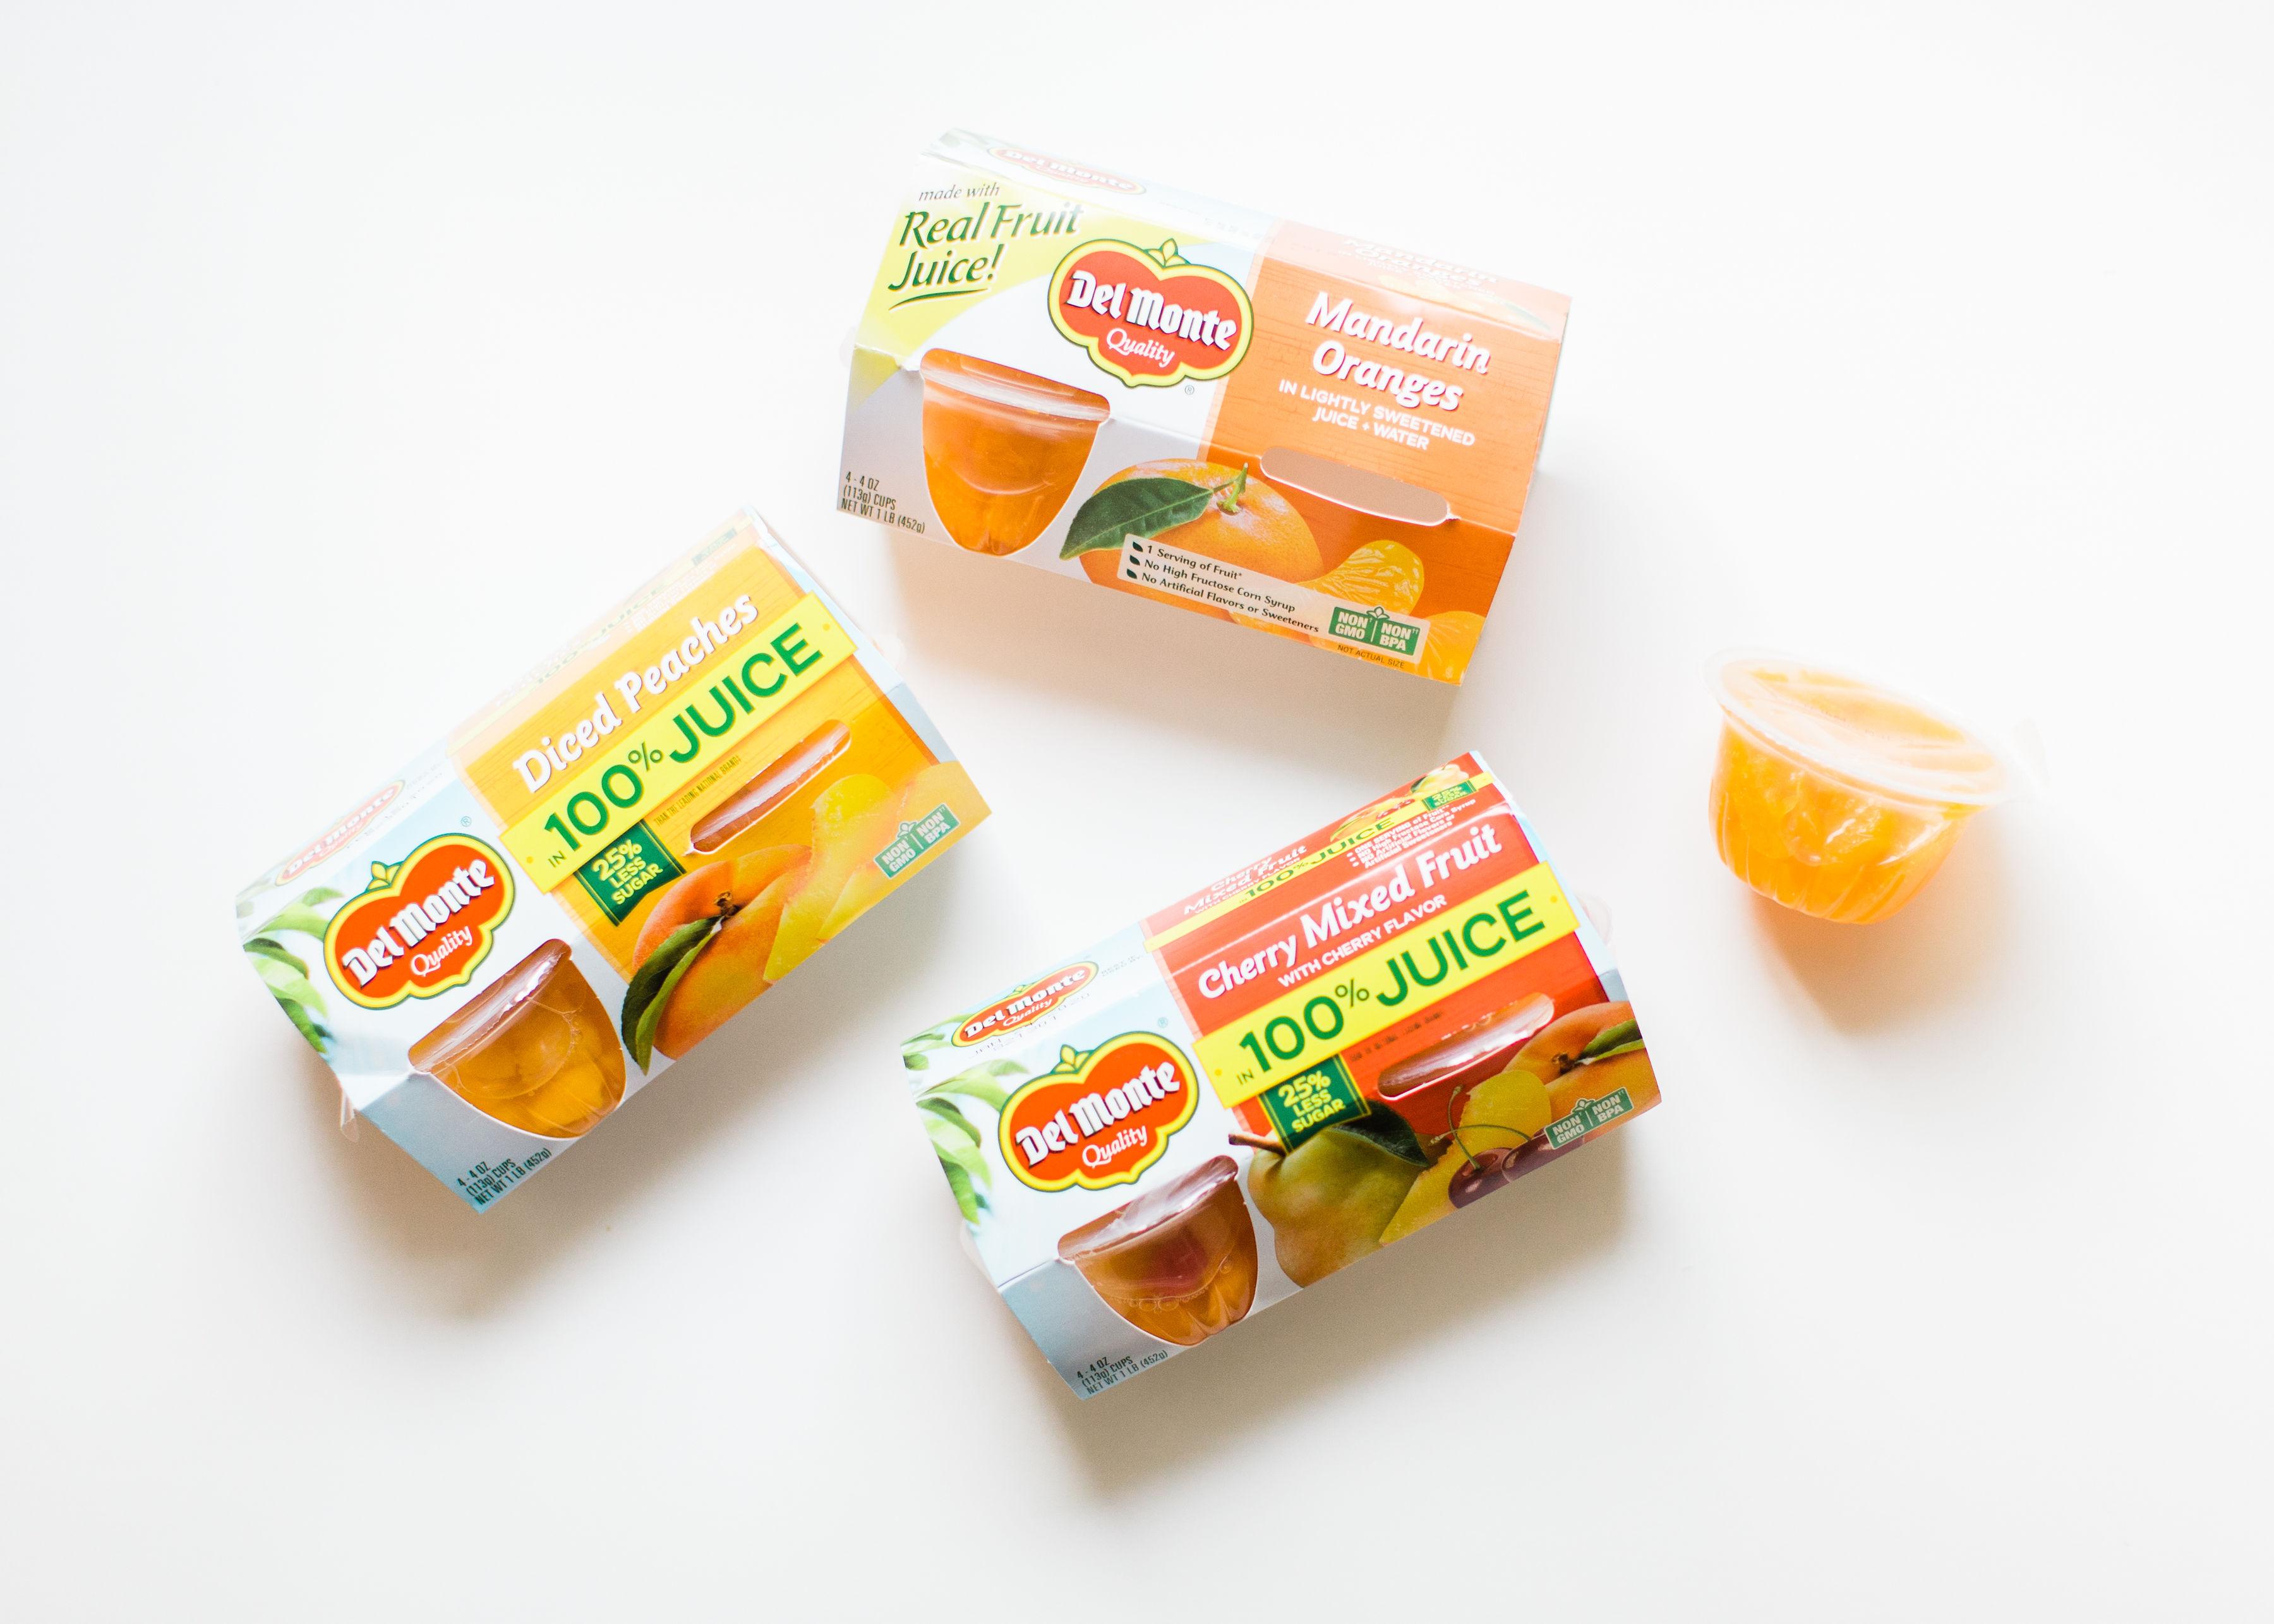 How to Create Healthy Snack Bins for Kids #snacks #snacktime #healthysnacks #snacksforkids   glitterinc.com   @glitterinc